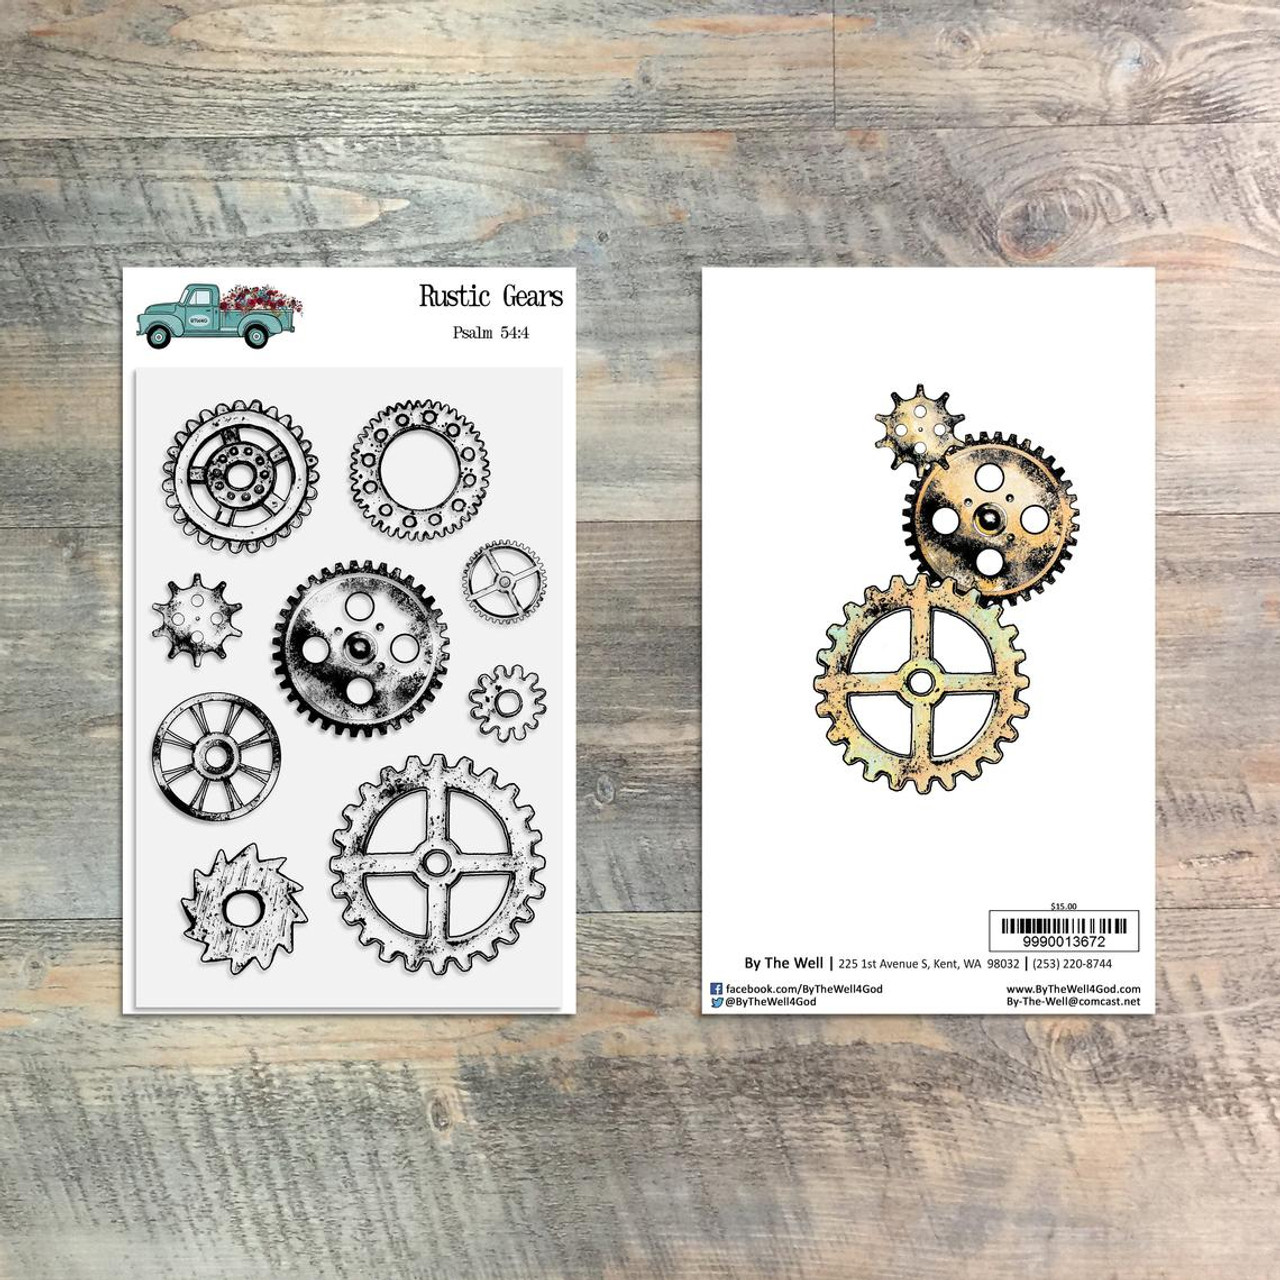 Rustic Gears Stamp Set - 9 Piece Stamp Set